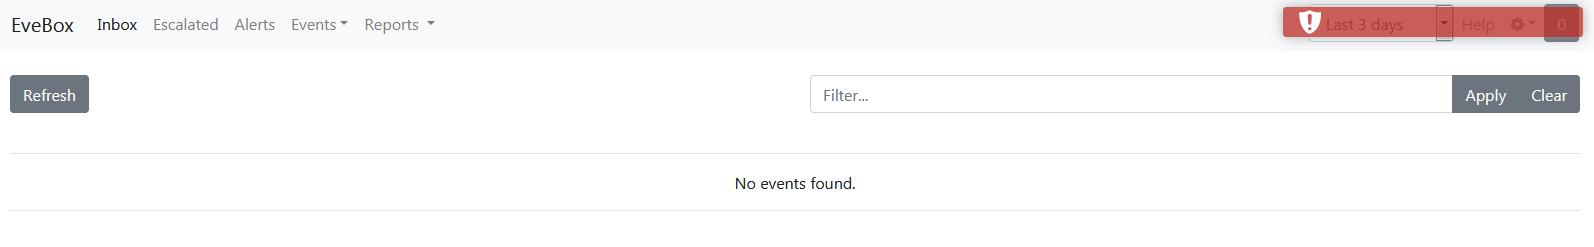 datastore-eventquery go:87) <Error> -- json: cannot